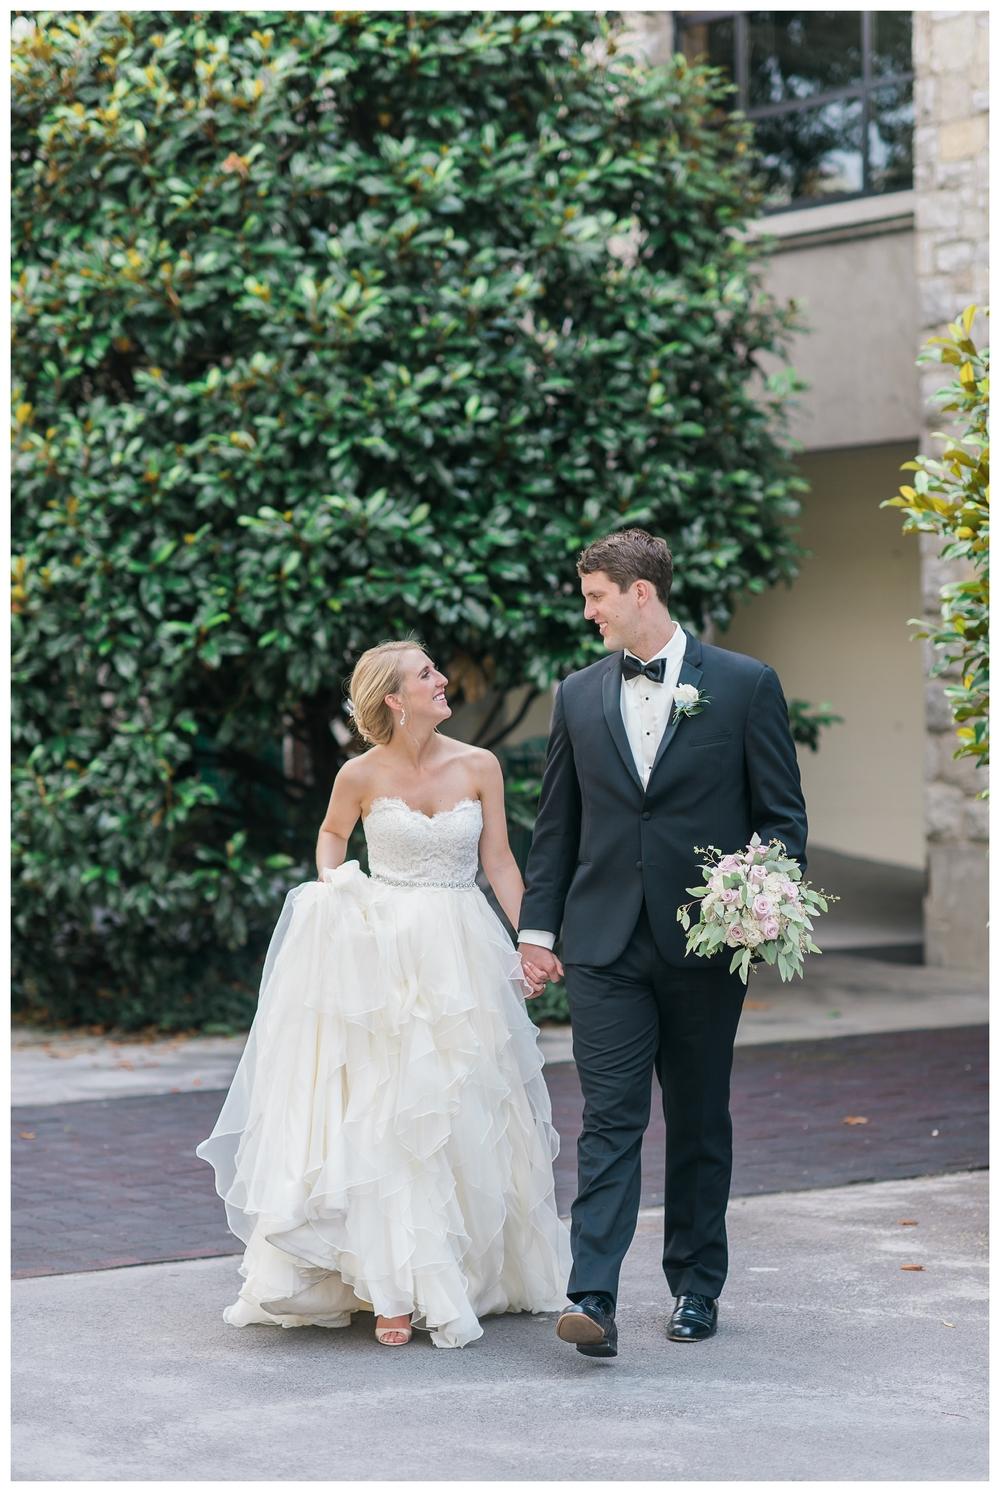 Rebecca_Bridges_Photography_Indianapolis_Wedding_Photographer_4551.jpg